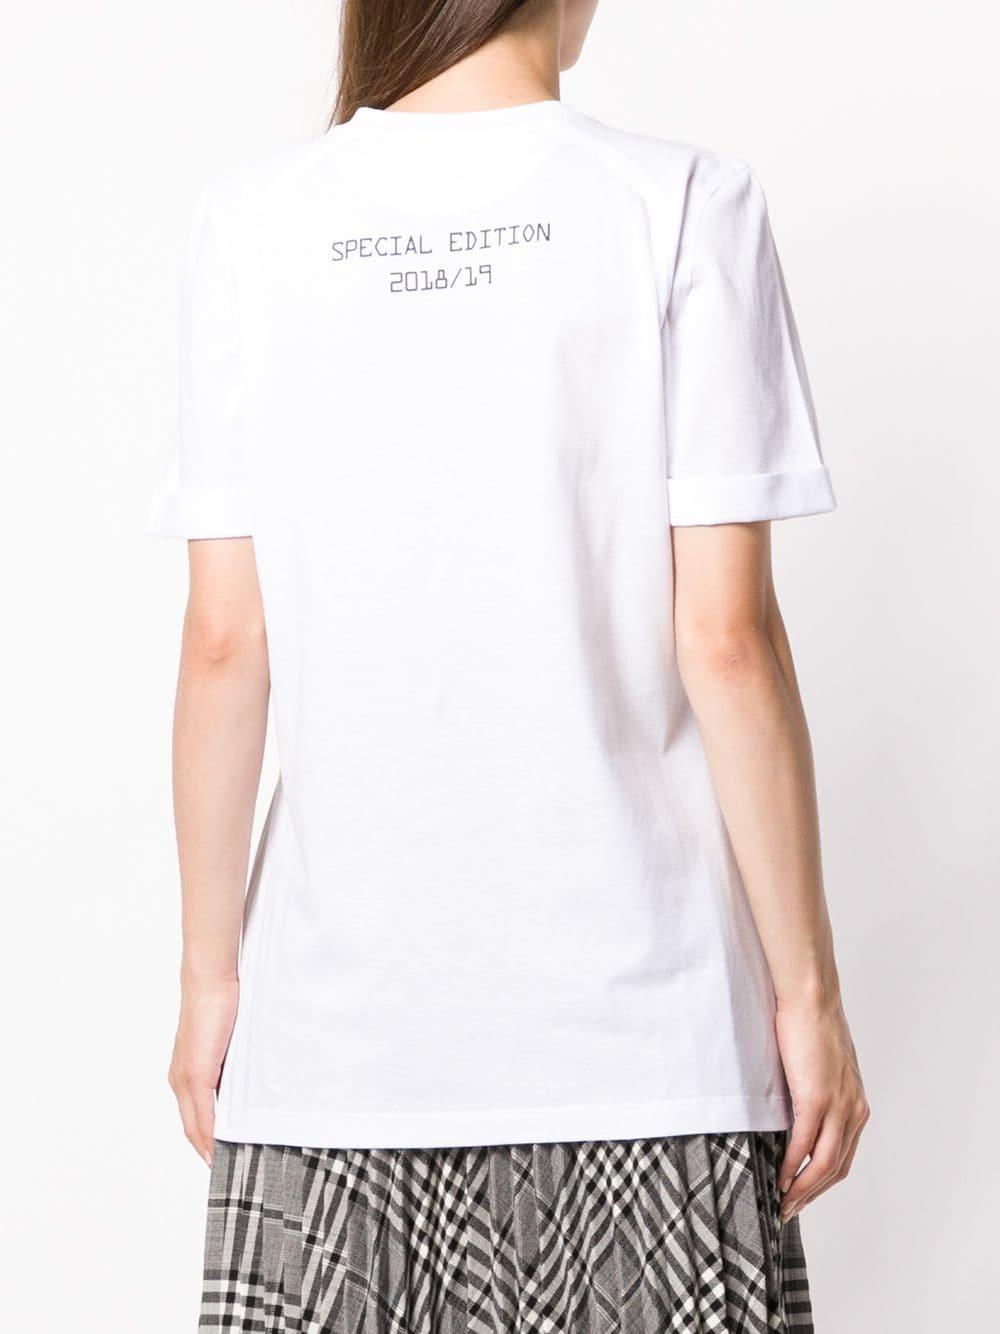 Fendi Women'S T-Shirt Short Sleeve Crew Neck Round In White